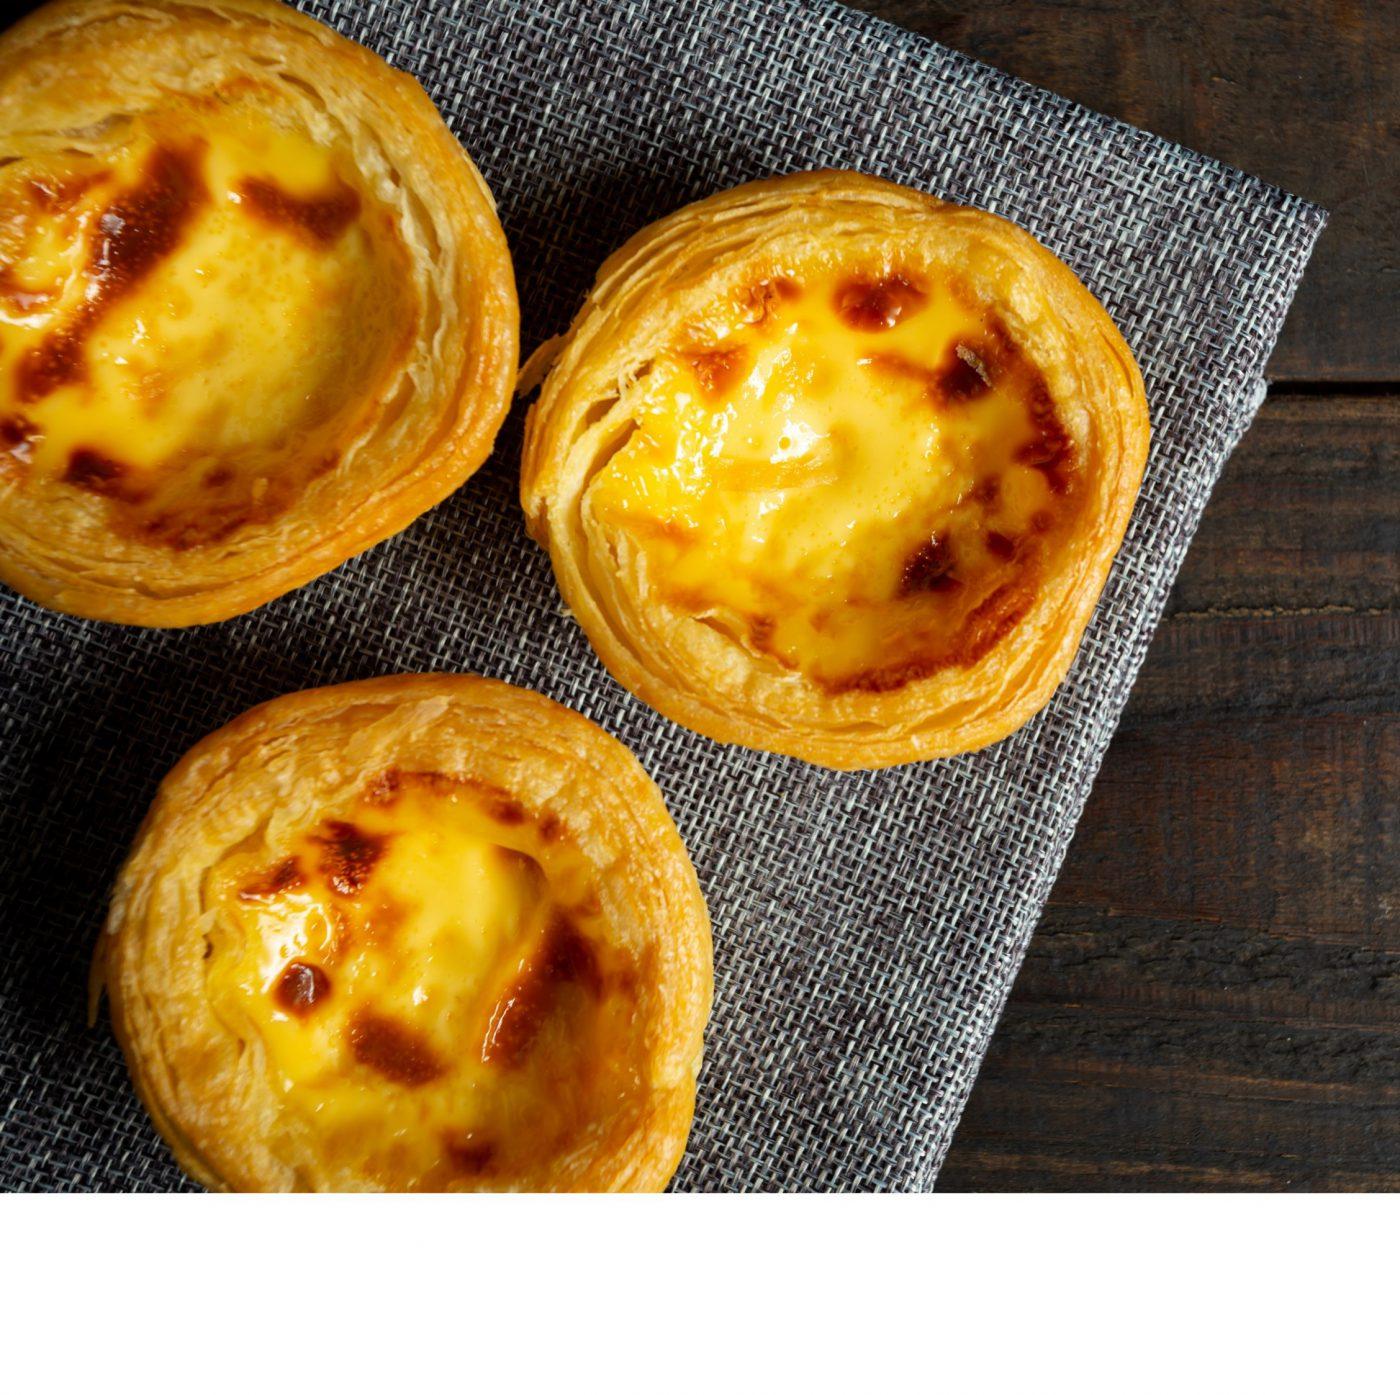 Image Portuguese Egg Tart